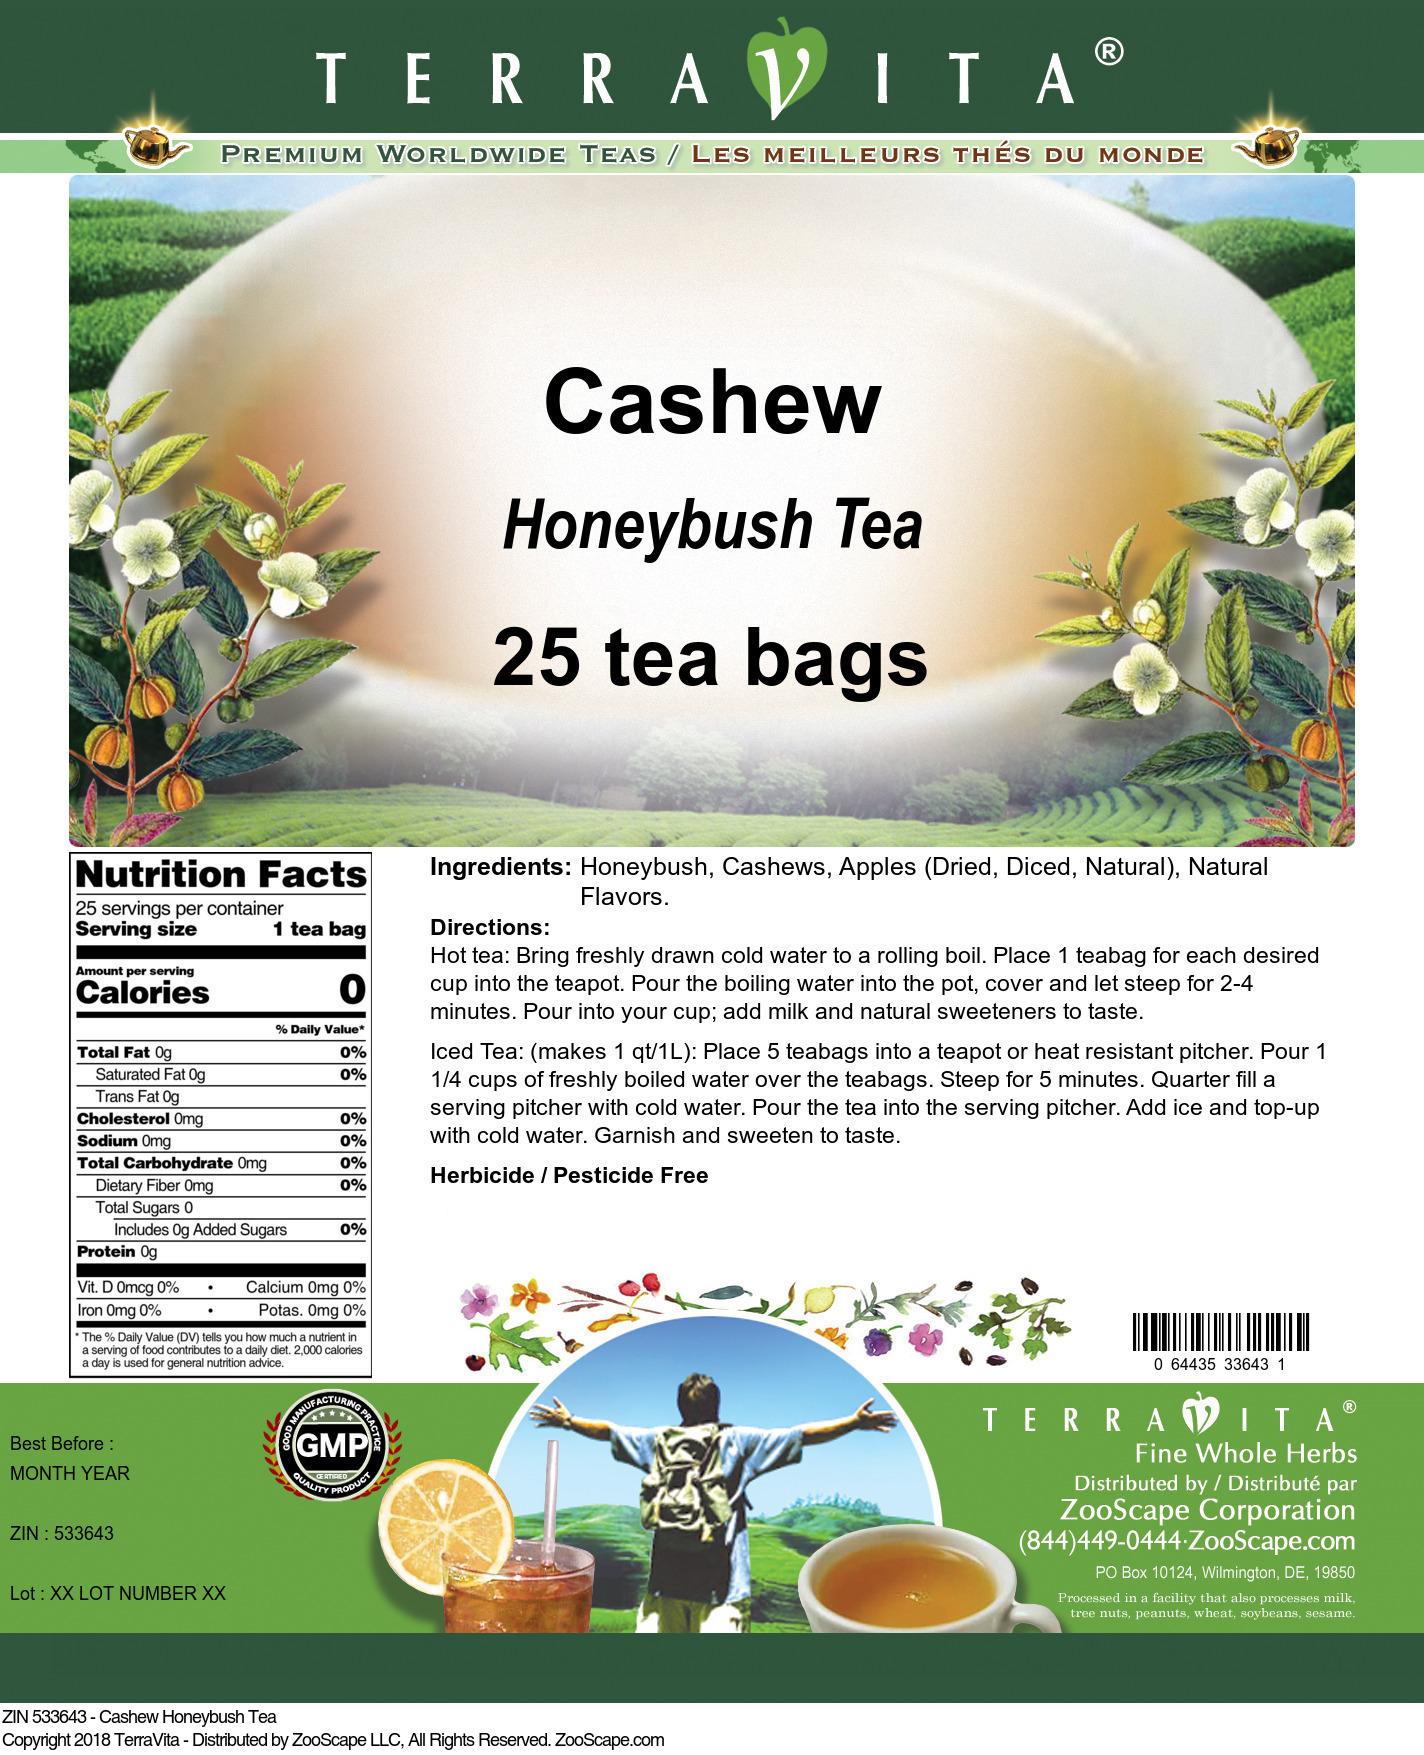 Cashew Honeybush Tea